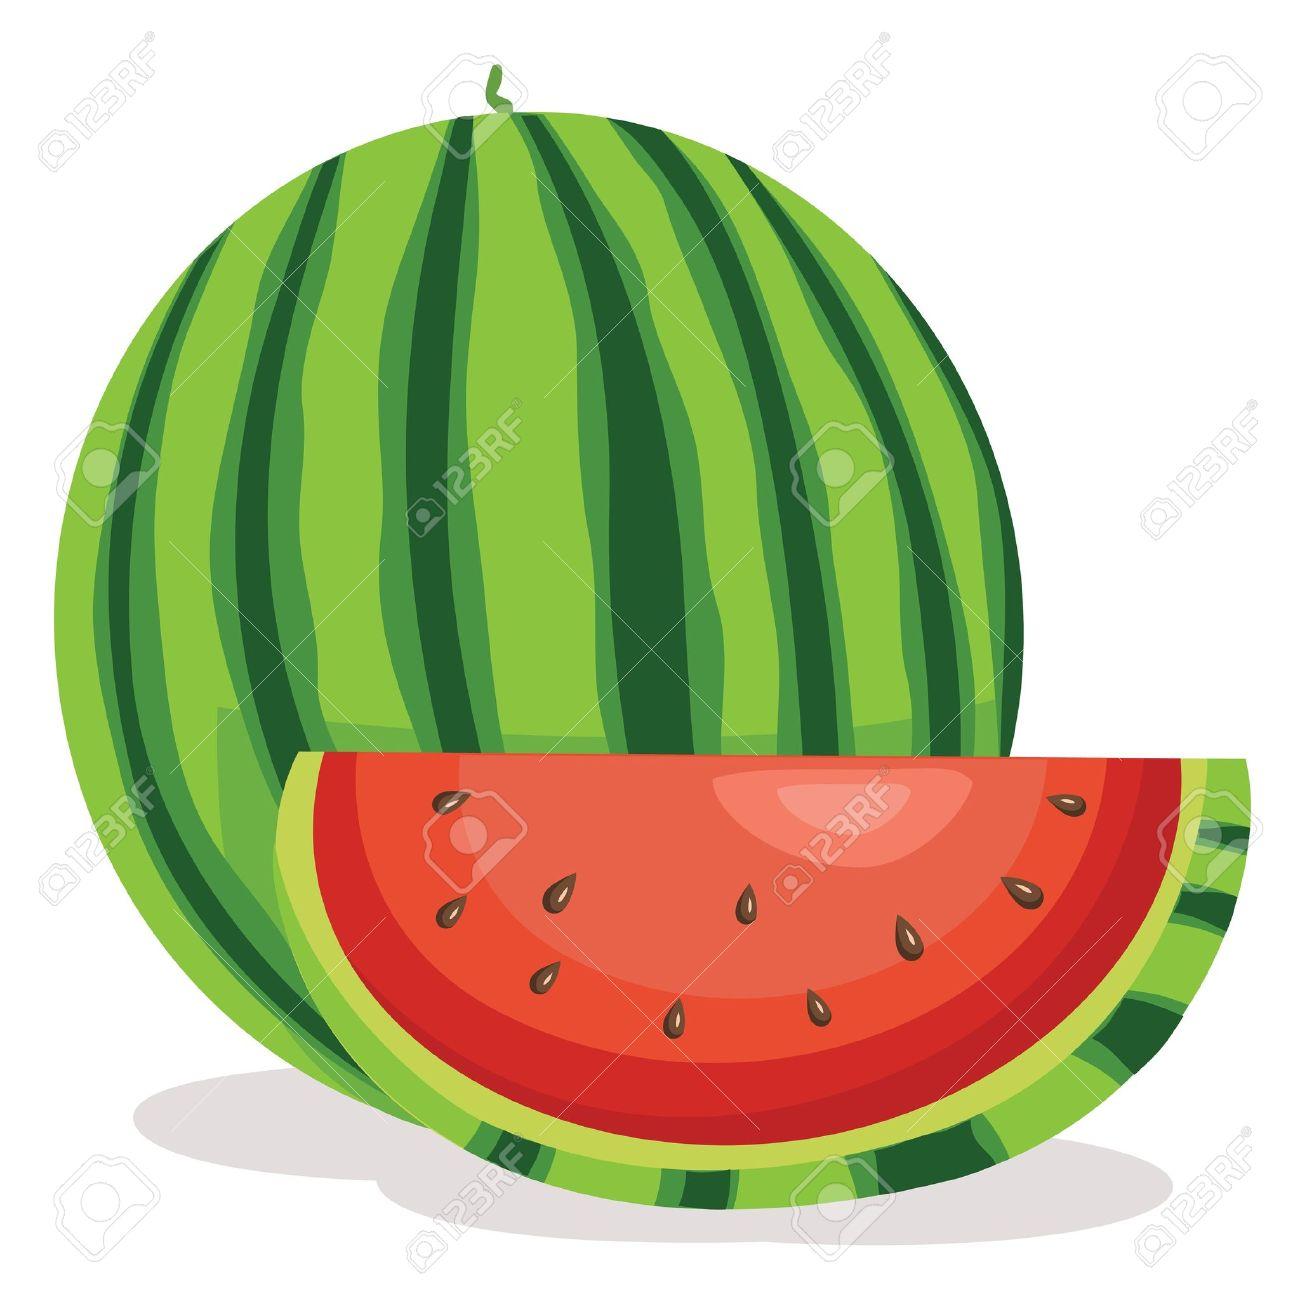 Watermelon illustration Stock Vector - 14199812